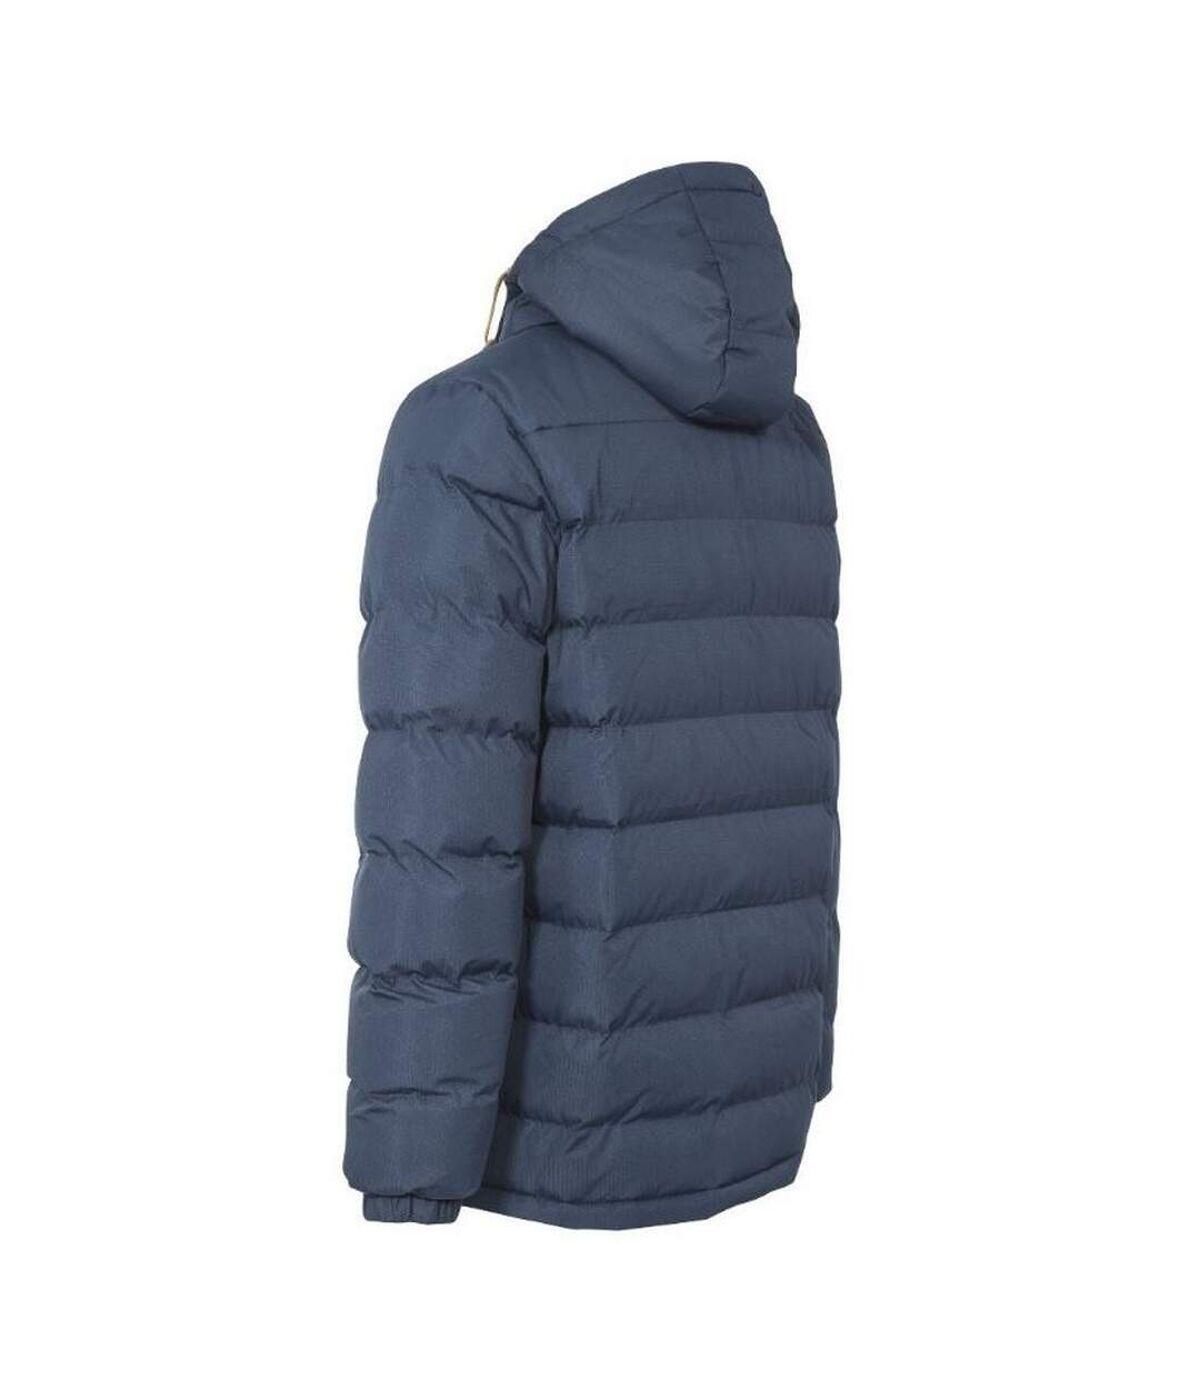 Trespass Mens Westmorland Padded Hooded Jacket (Navy) - UTTP4528